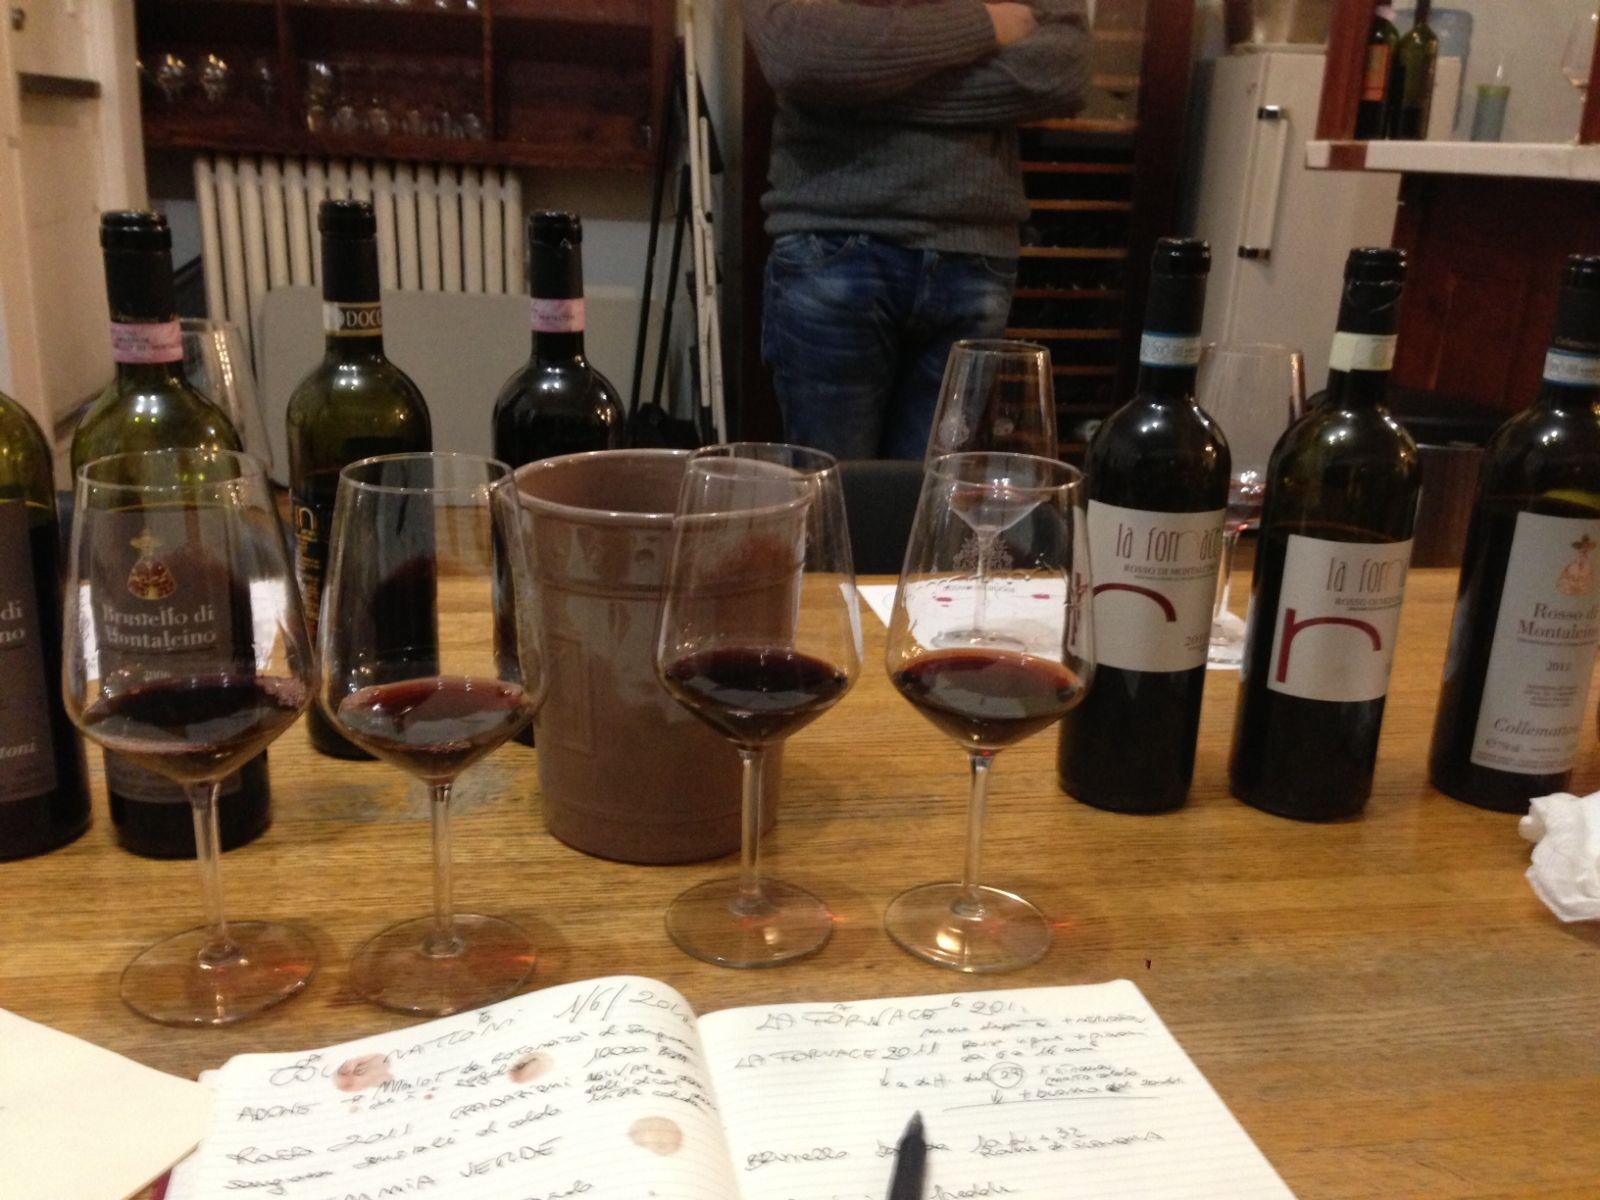 Taste of Montalcino